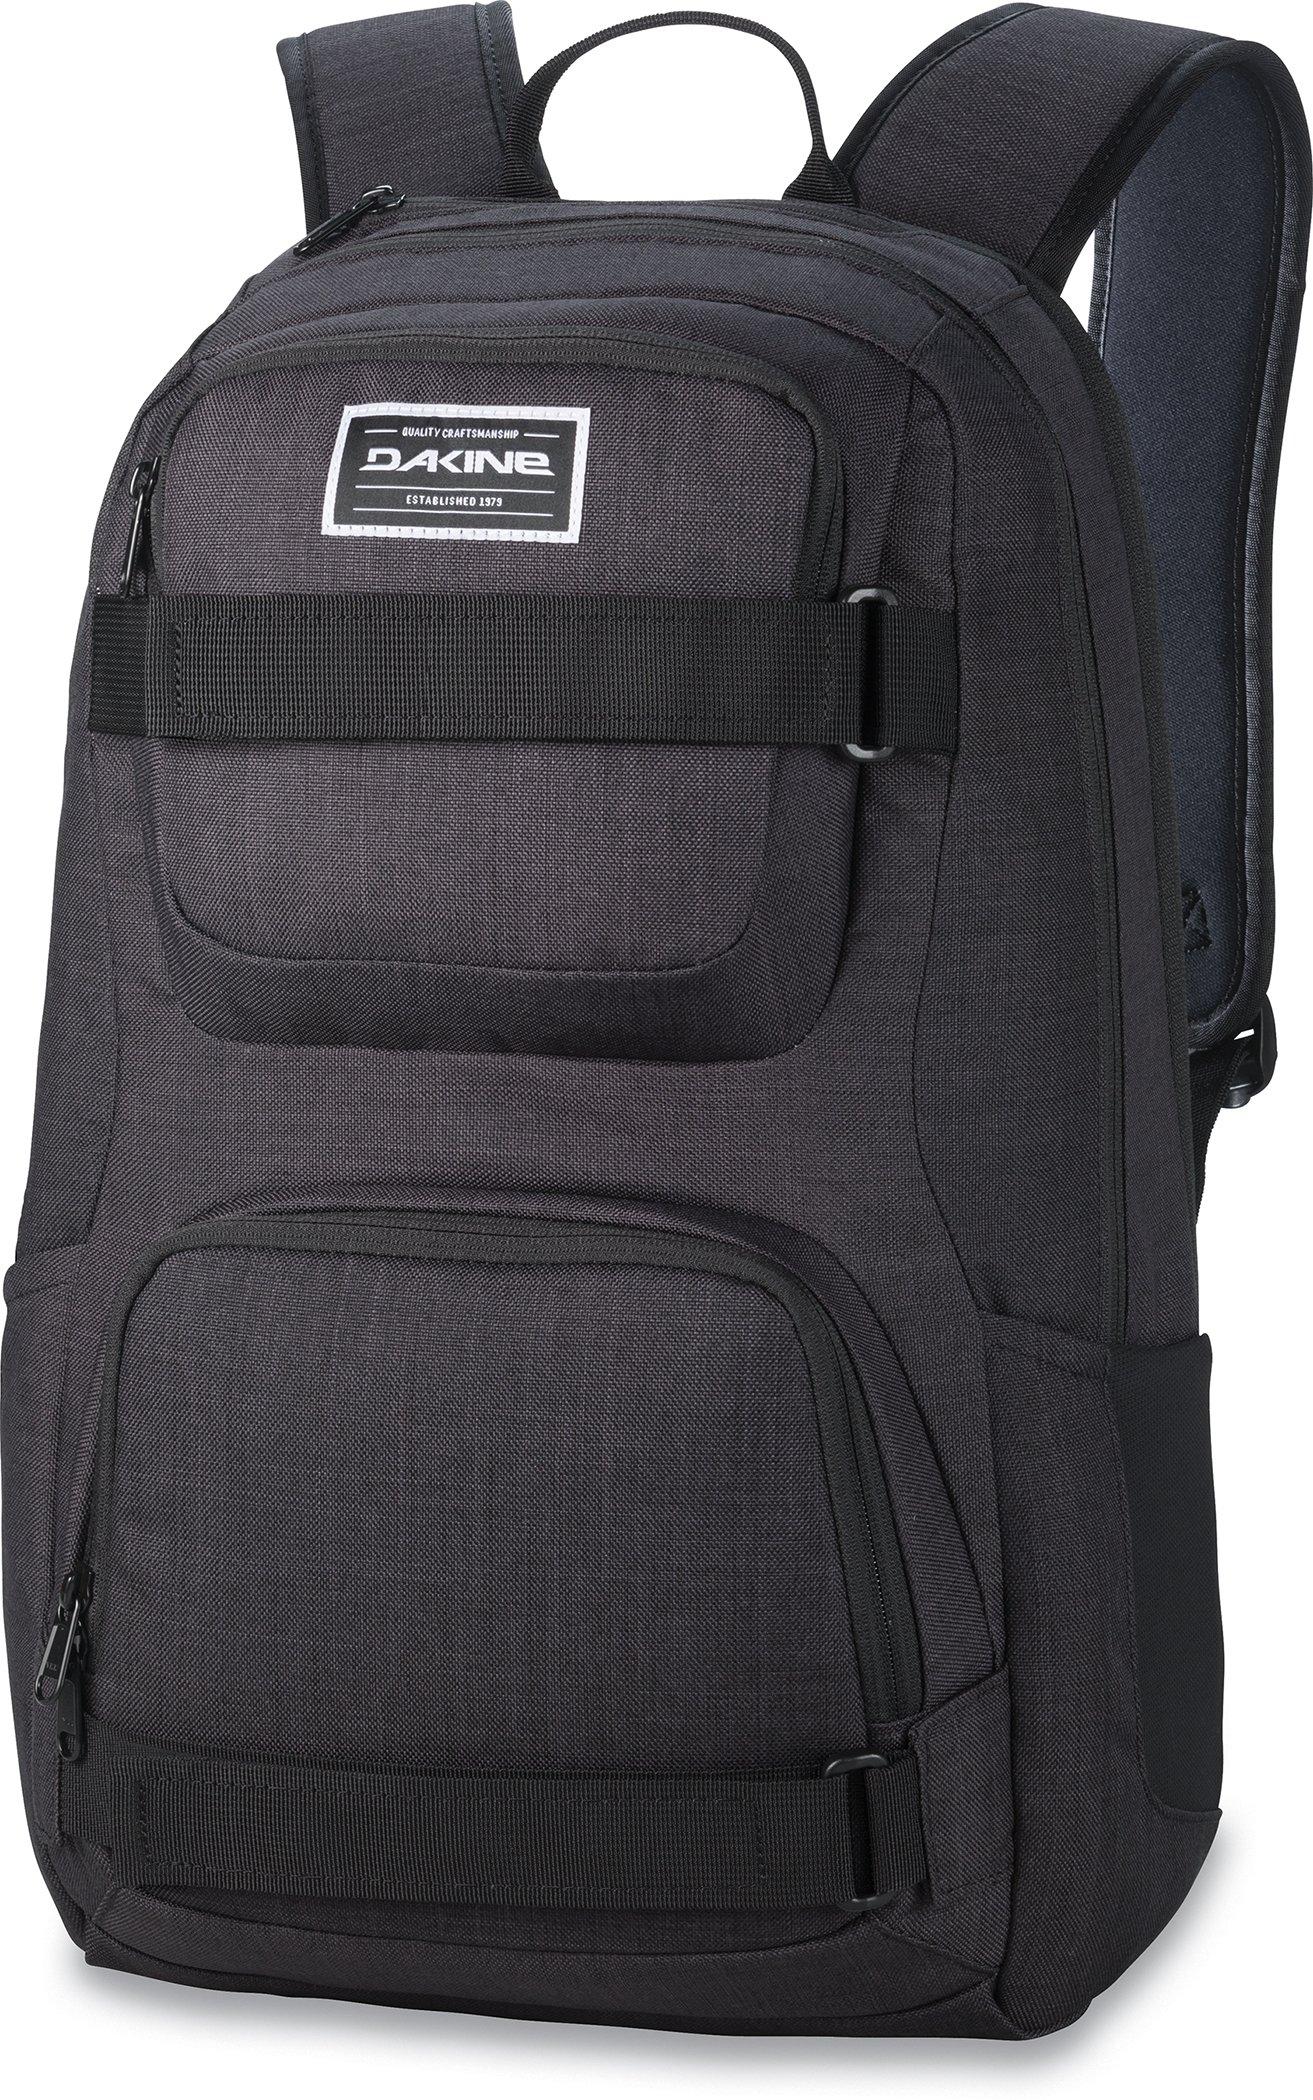 Dakine - Duel 26L Backpack - Padded Laptop & iPad Sleeve - Insulated Cooler Pocket - Mesh Side Pockets - 19'' x 12'' x 9'' (Black)